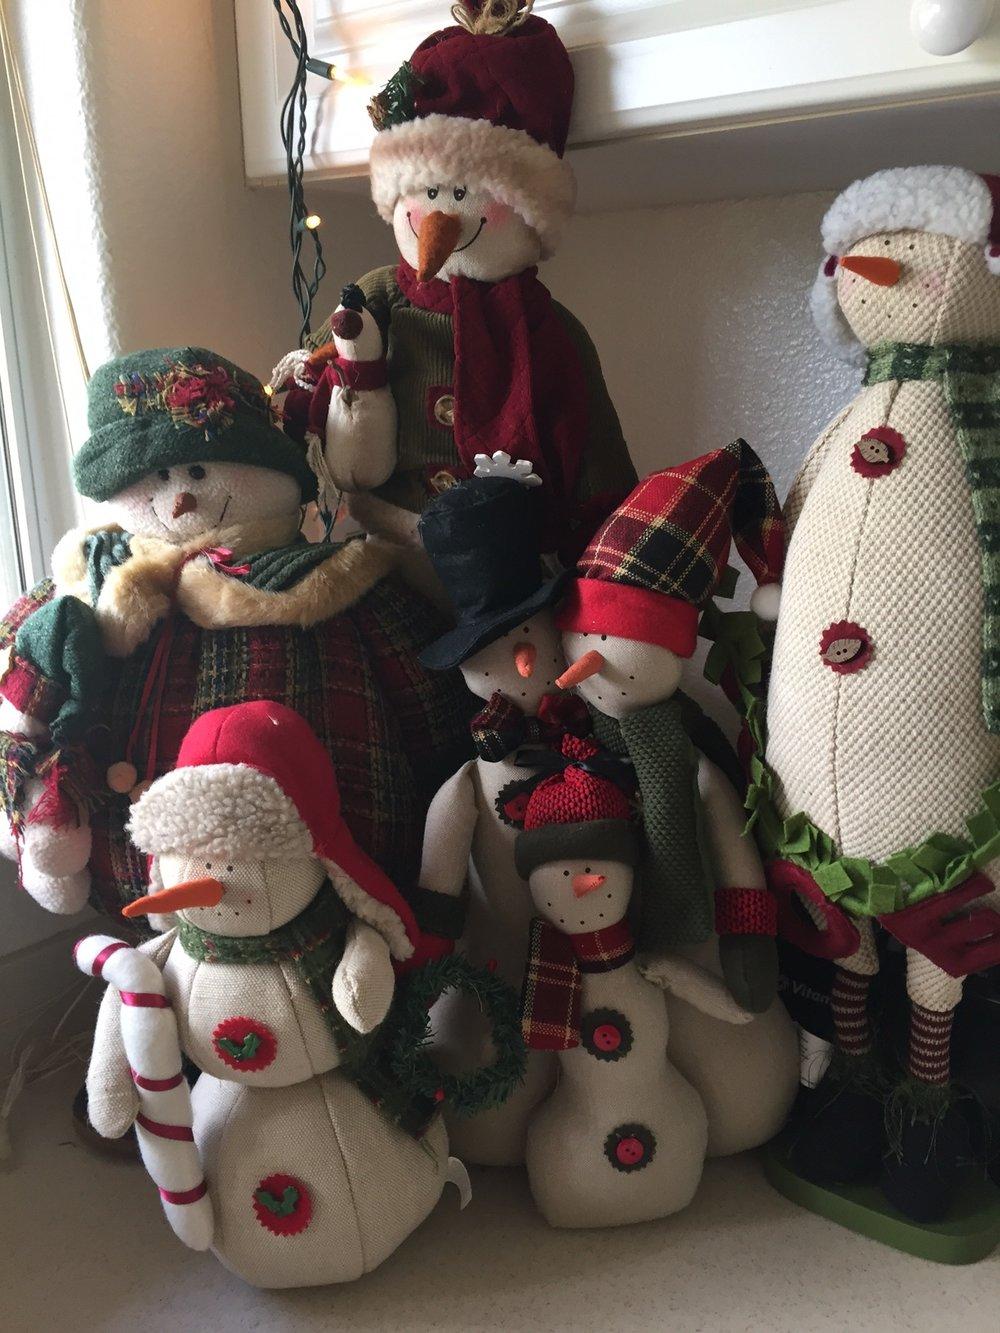 Snowman family - www.stampedwithaloha.com